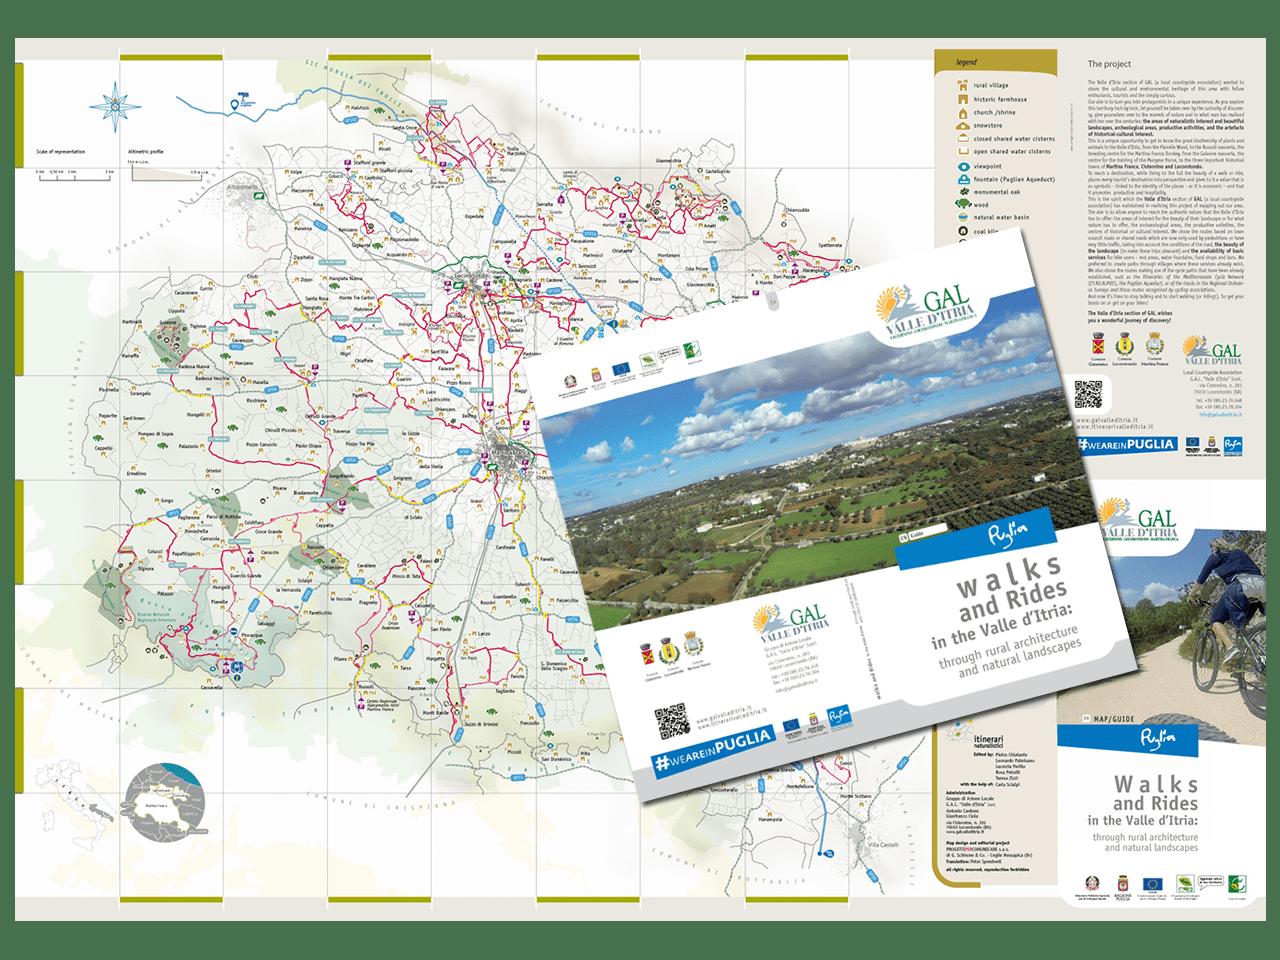 Cartoguida - itinerari - Valle d'Itria - Martina Franca - Cisternino - gal Valle d'Itria - Locorotondo - Fiab - trekking - bici- Puglia - PxC Edizioni